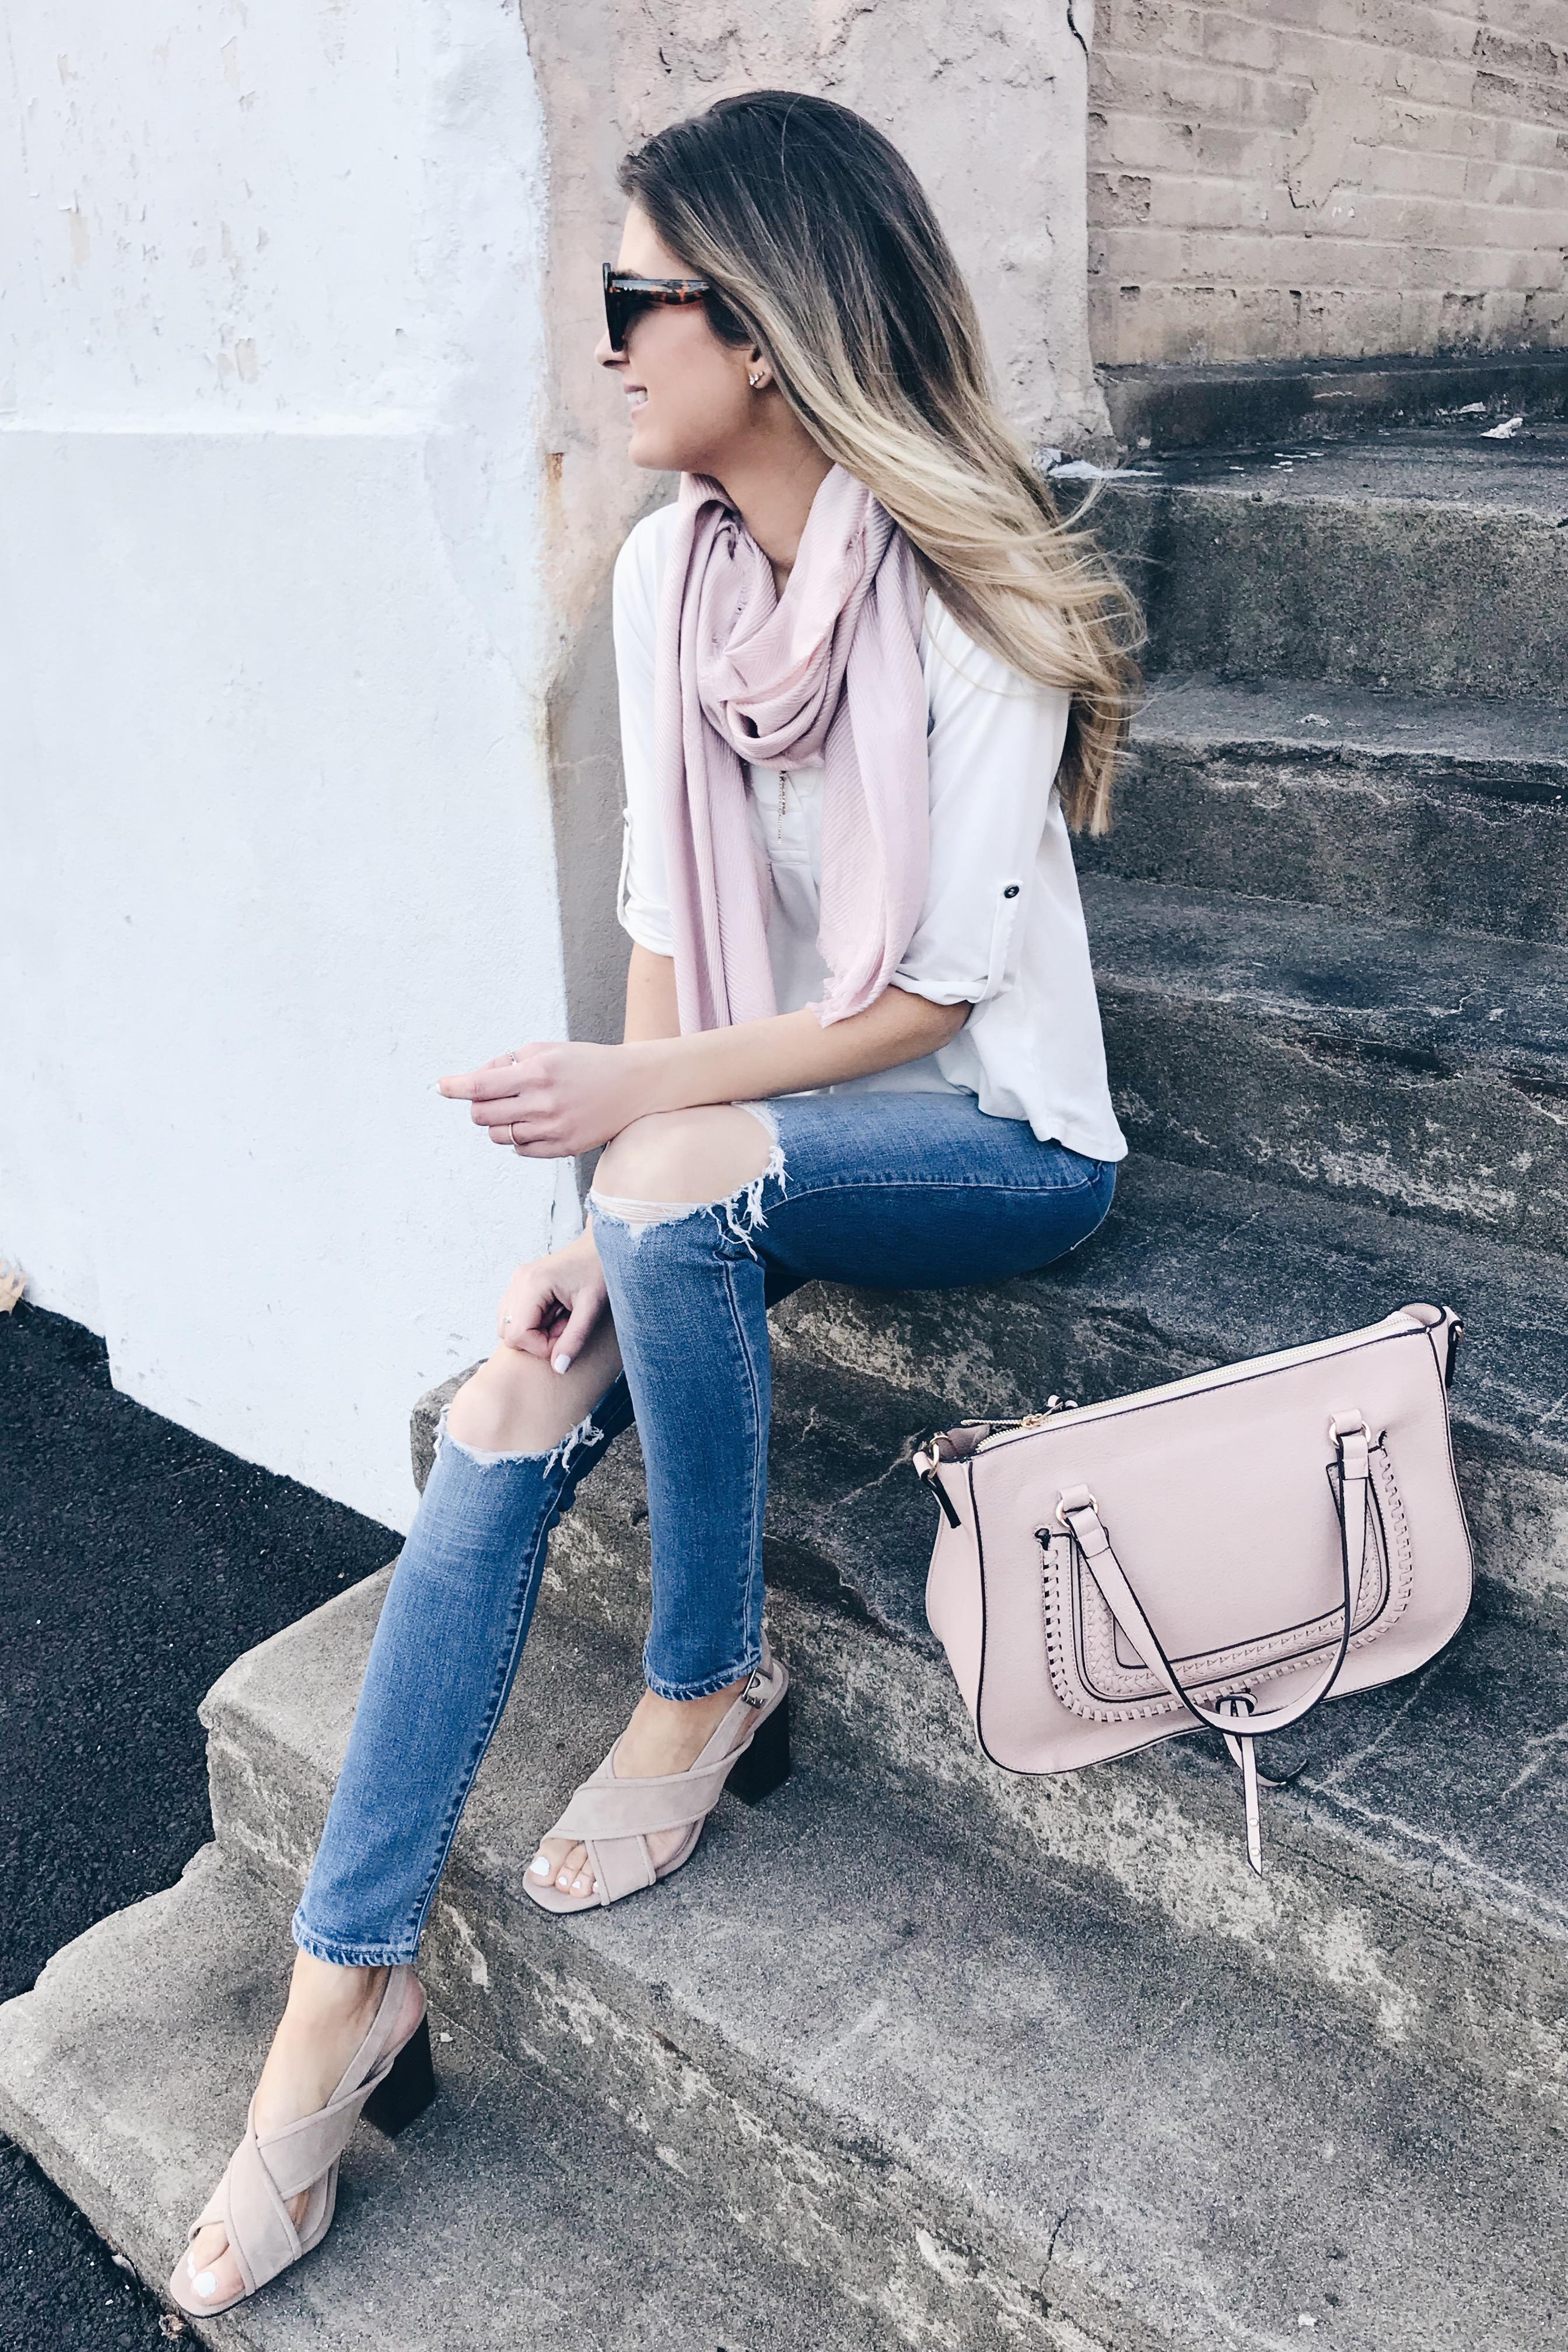 Spring Handbags 2019 - blush satchel and crossover heel sandals on Pinteresting Plans blog